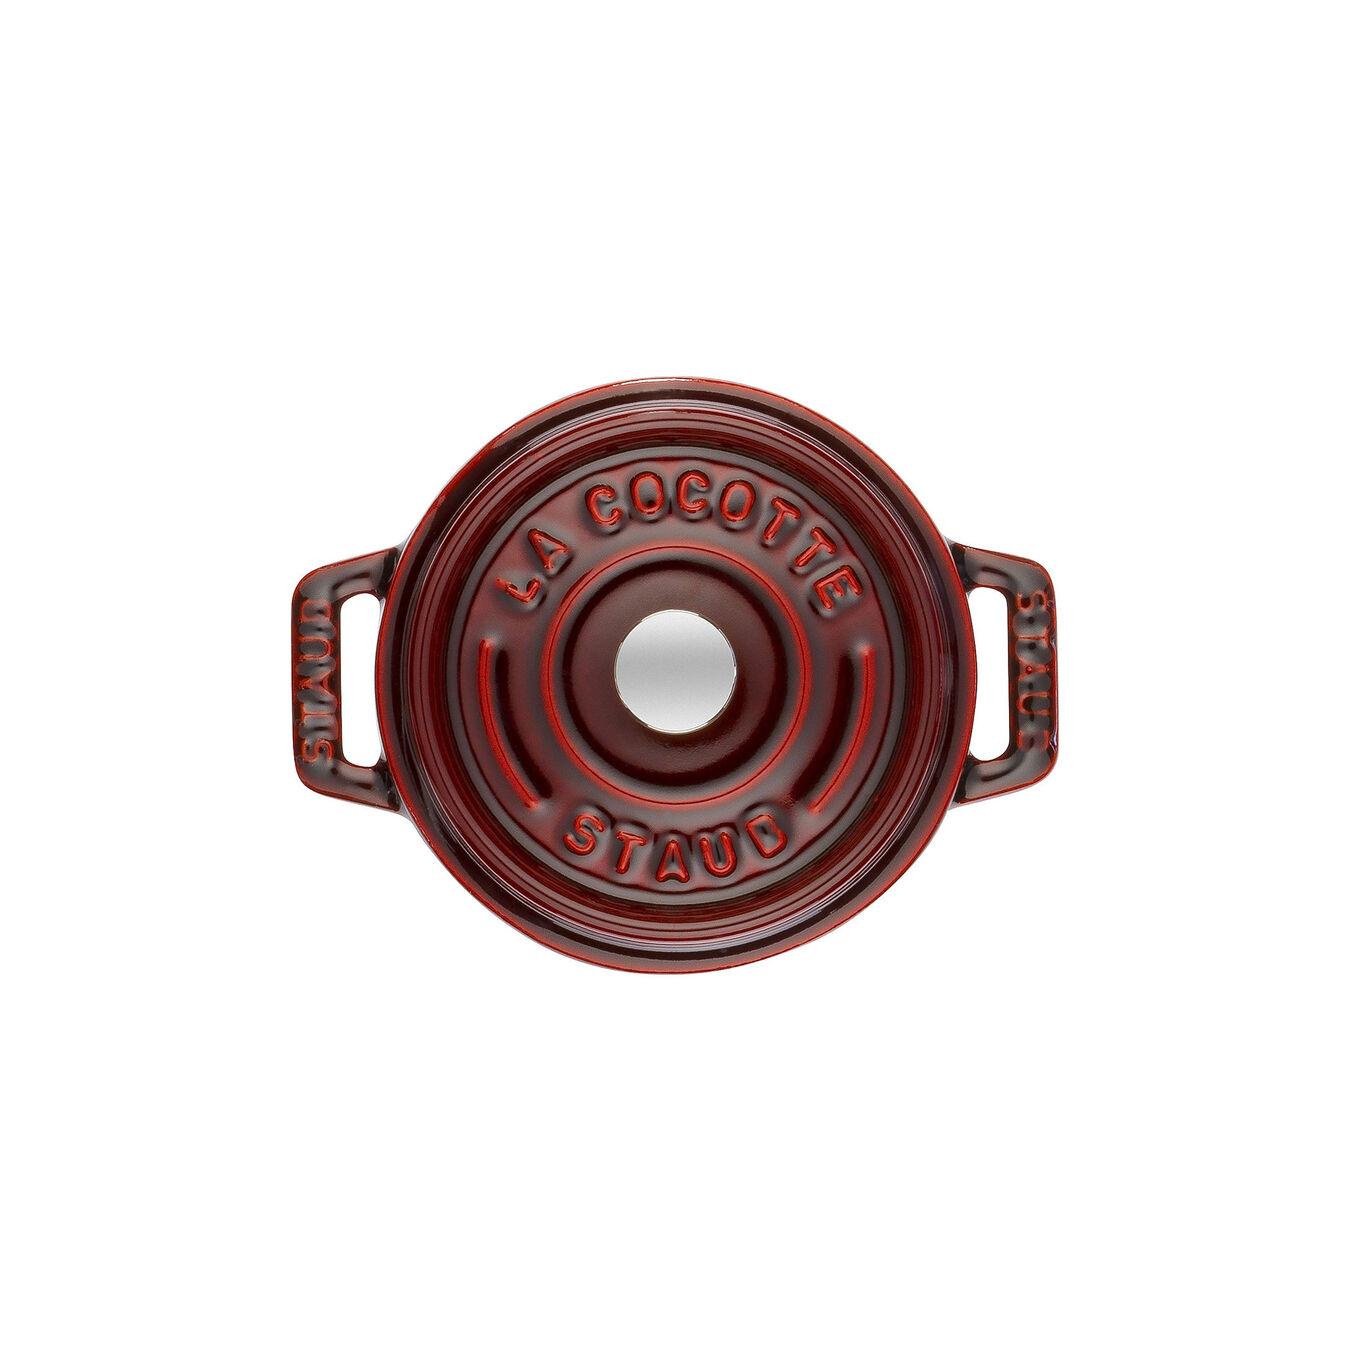 Mini cocotte rotonda - 10 cm, granatina,,large 2